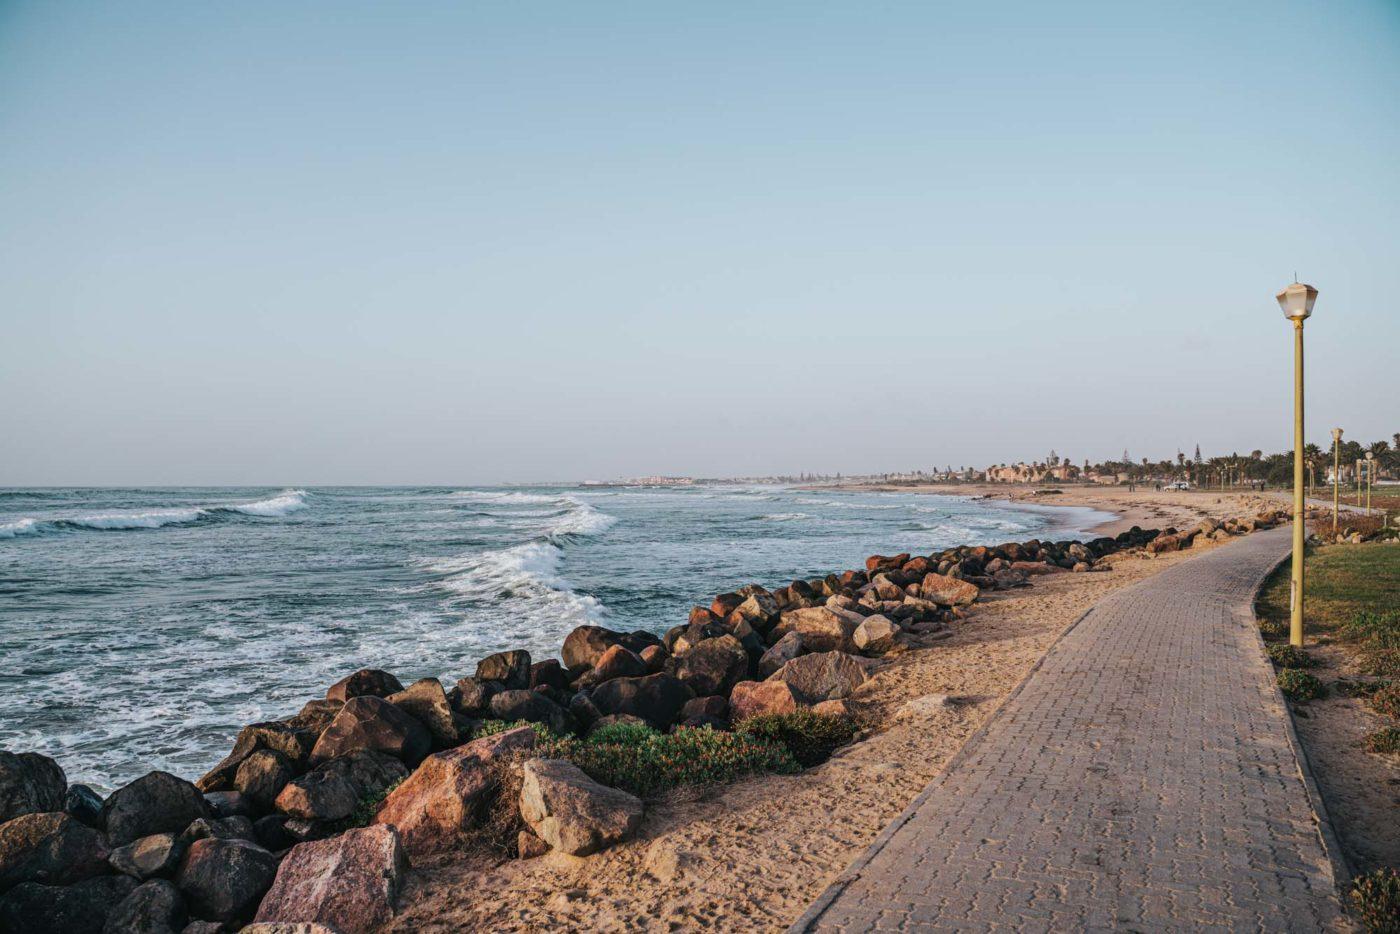 Coastline in Swakopmund, Namibia